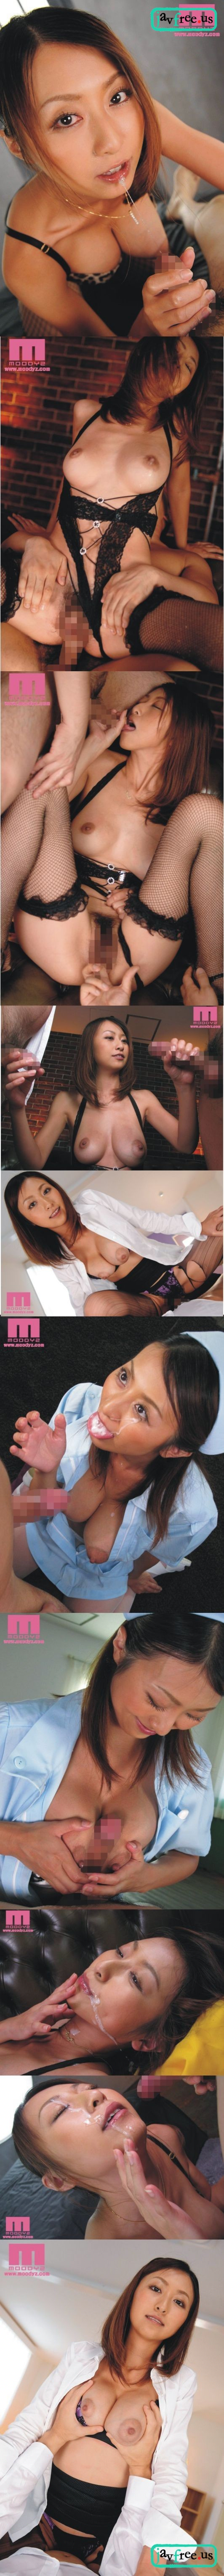 [MIDD-718] チ○ポを鍛える励まし淫語セックス 青木玲 - image midd-718 on https://javfree.me